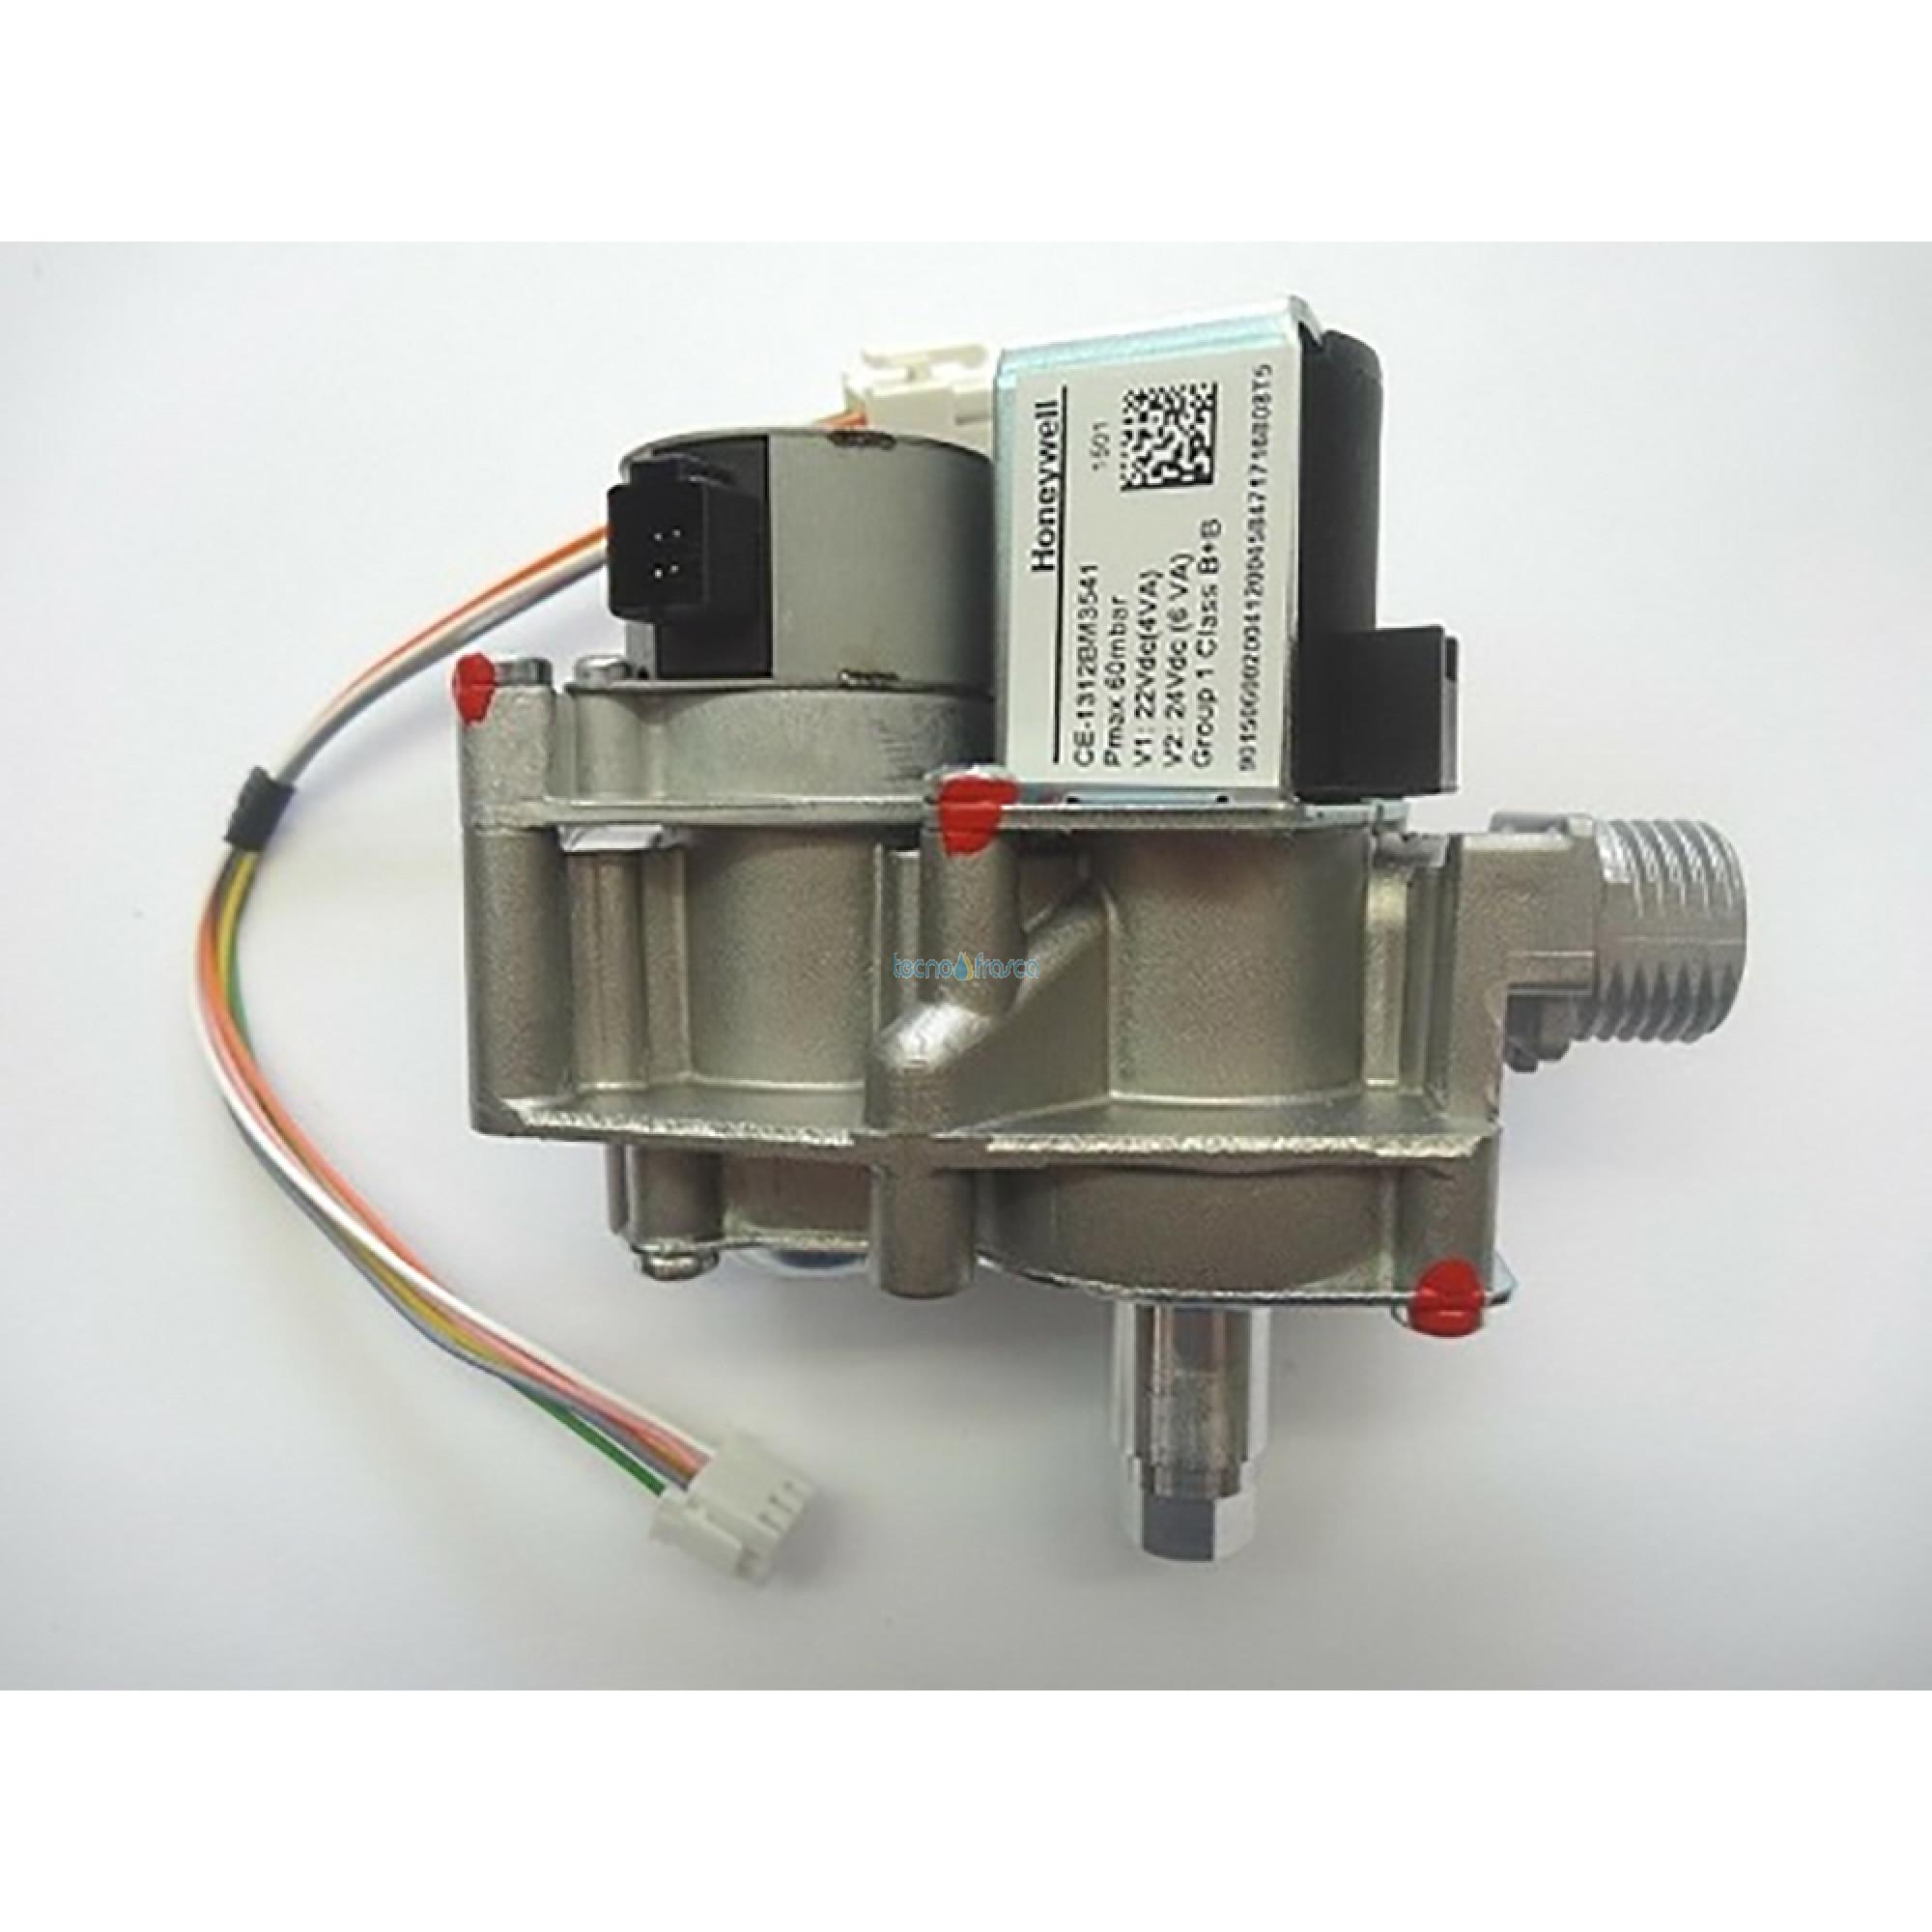 Bongioanni valvola gas con regolatore metano 007008552